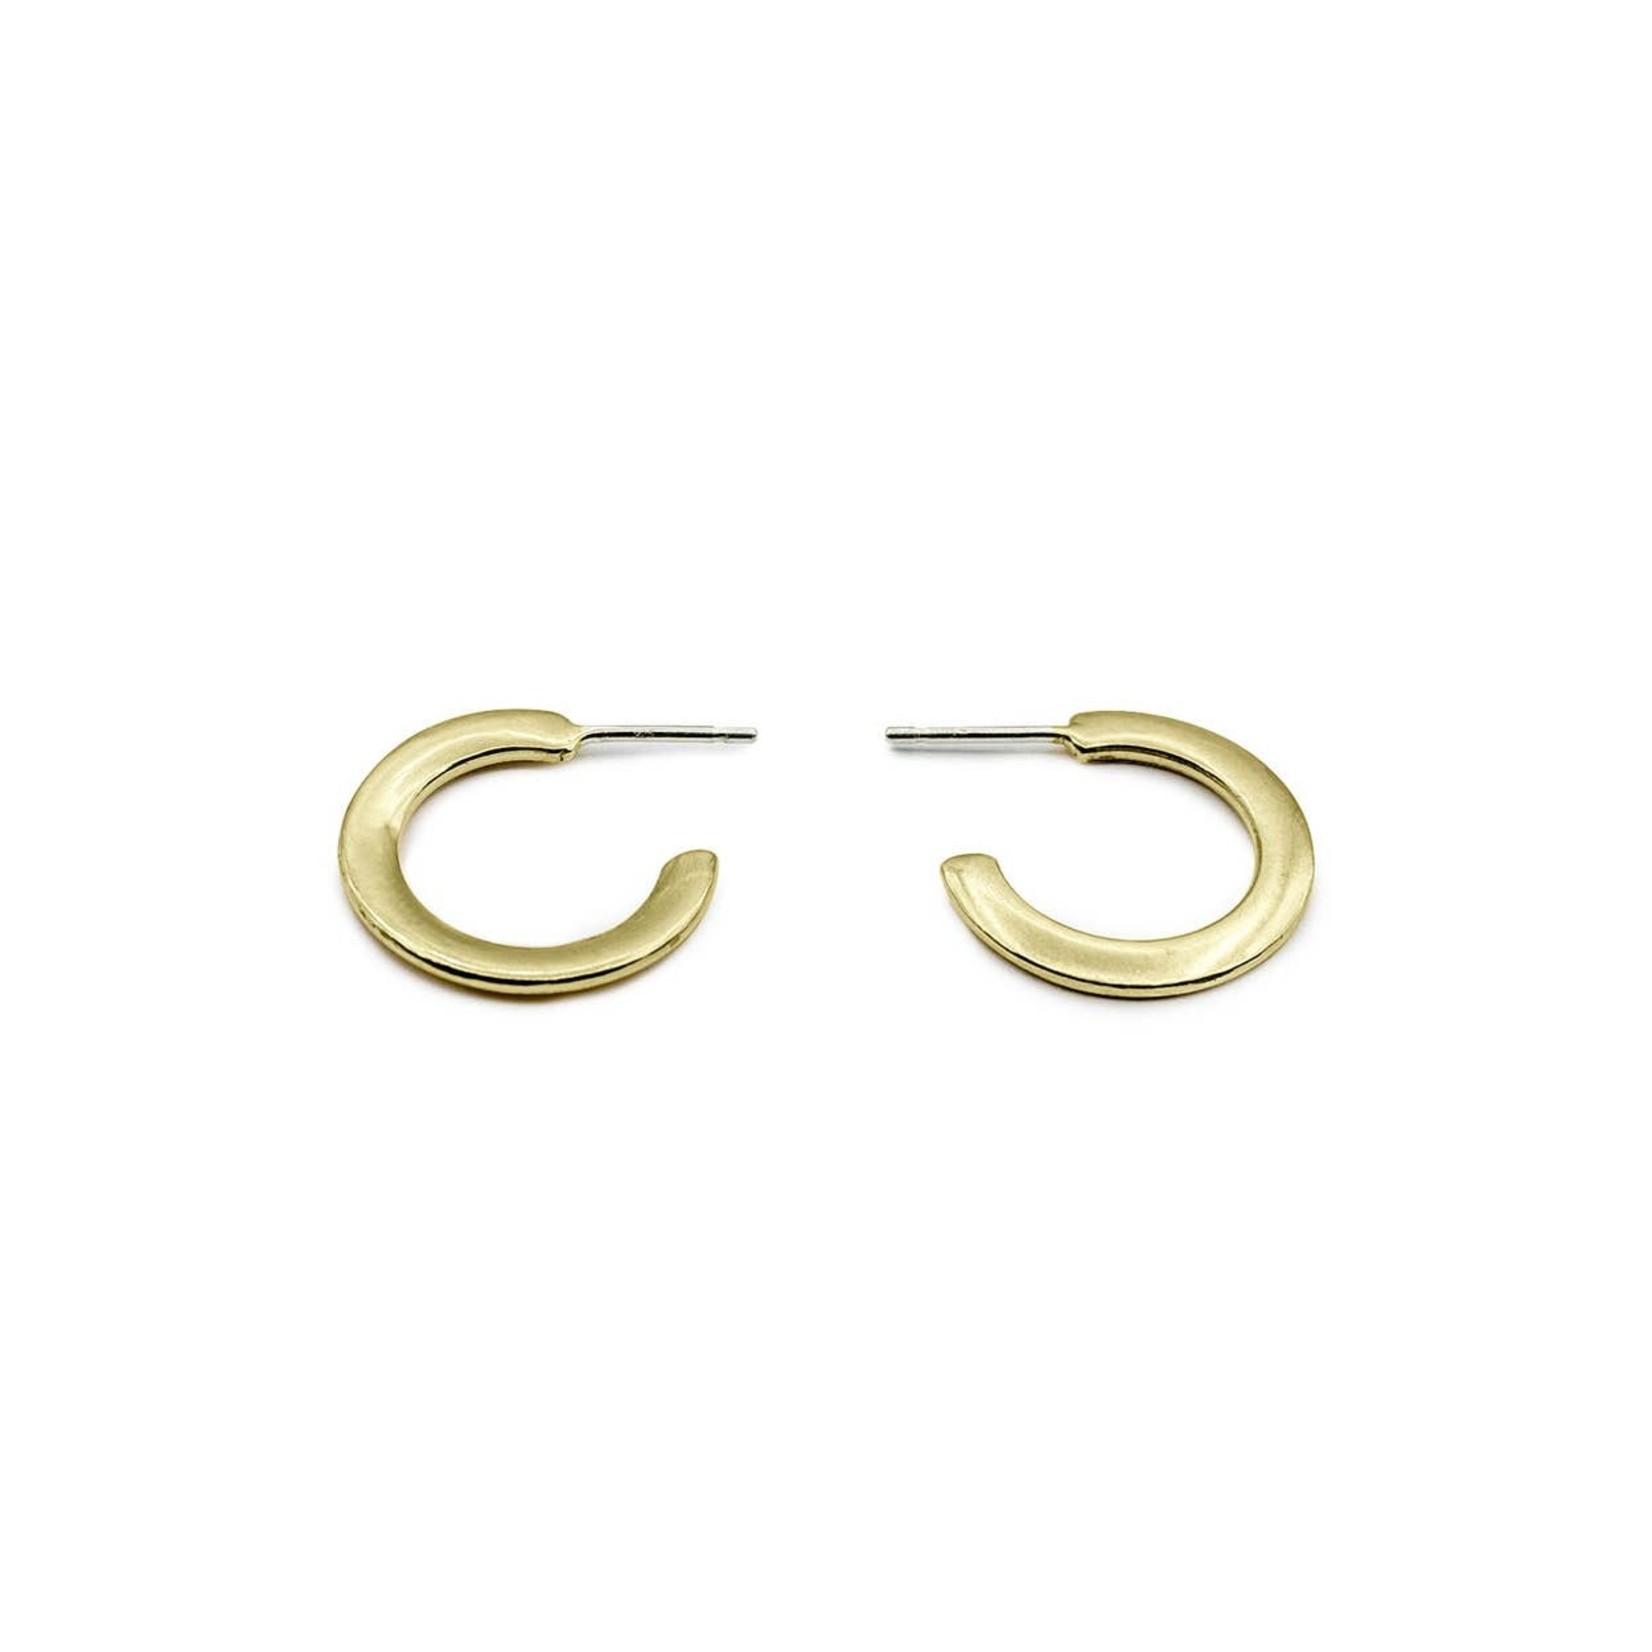 Mana Made Jewelry Mana Made Classic Hoop Earring Brass